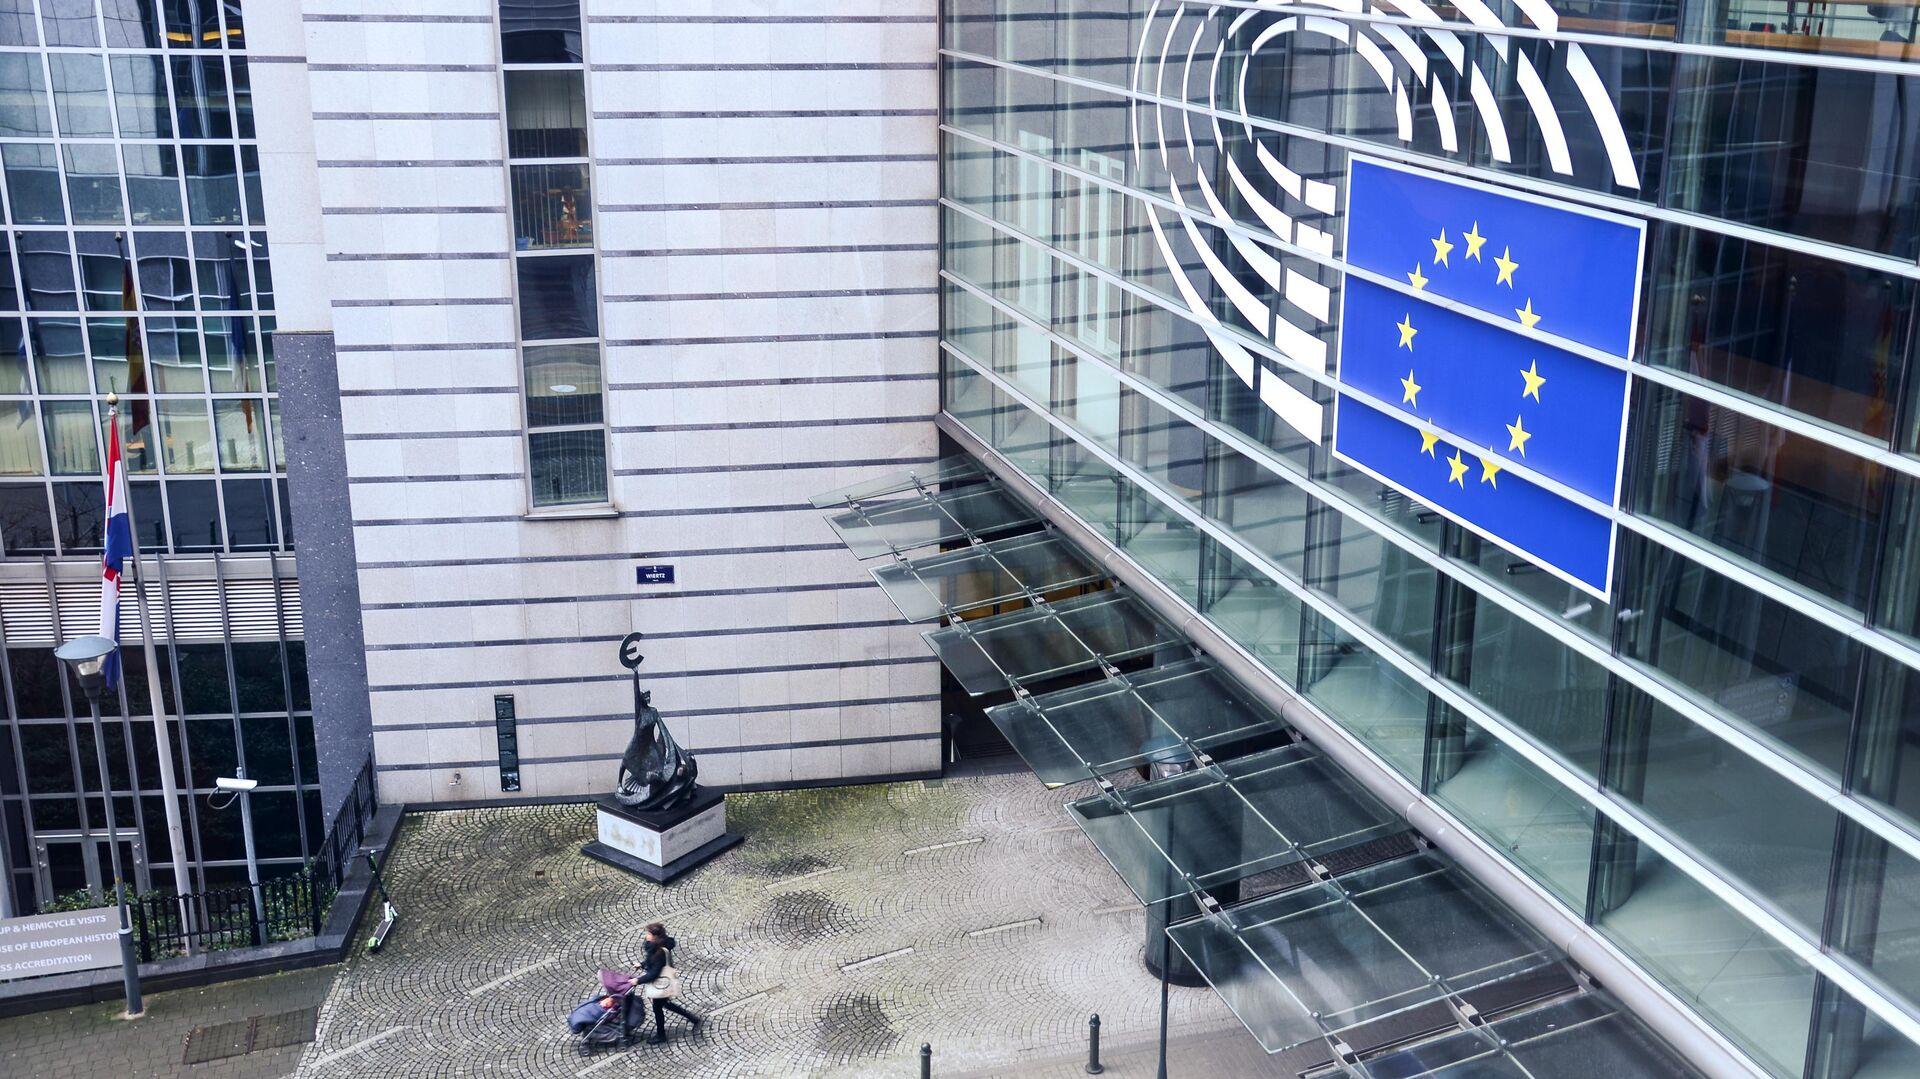 Здание Европарламента в Брюсселе - РИА Новости, 1920, 21.01.2021